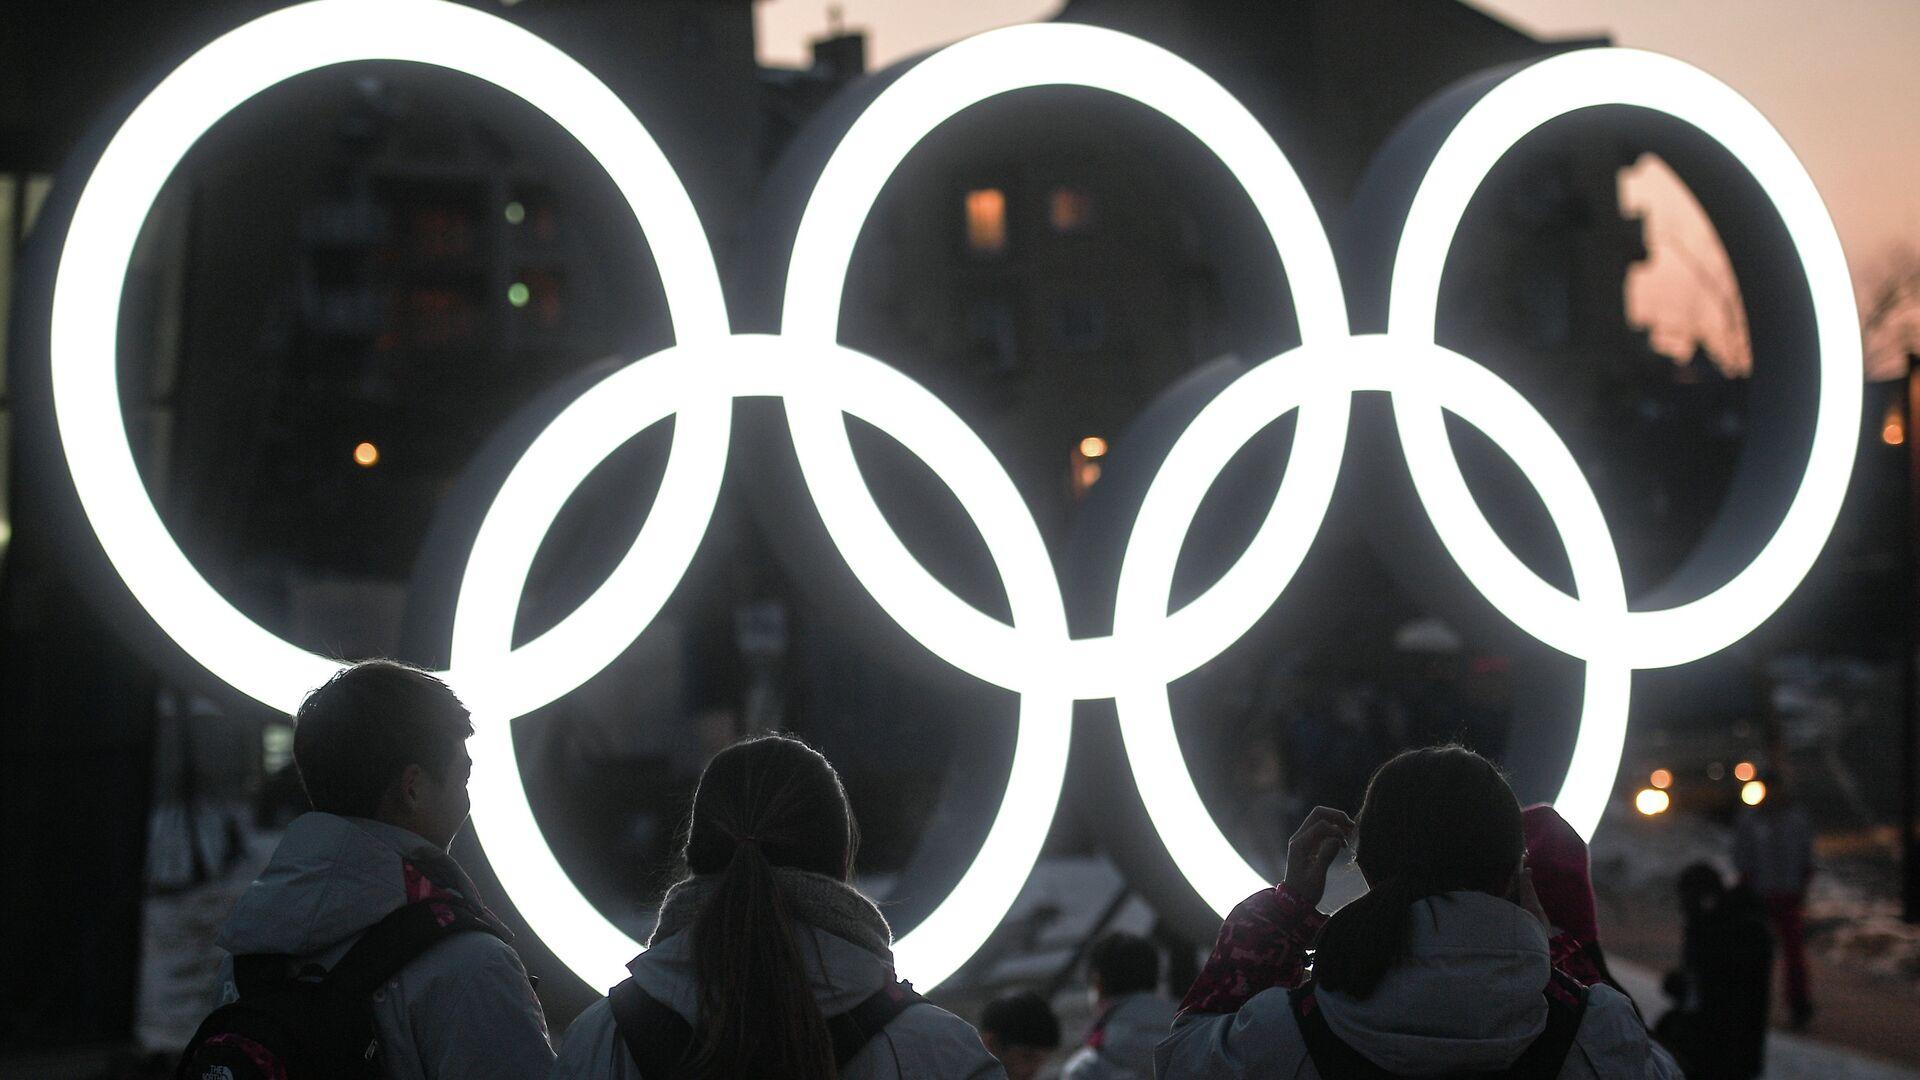 Олимпийские кольца - РИА Новости, 1920, 02.03.2021